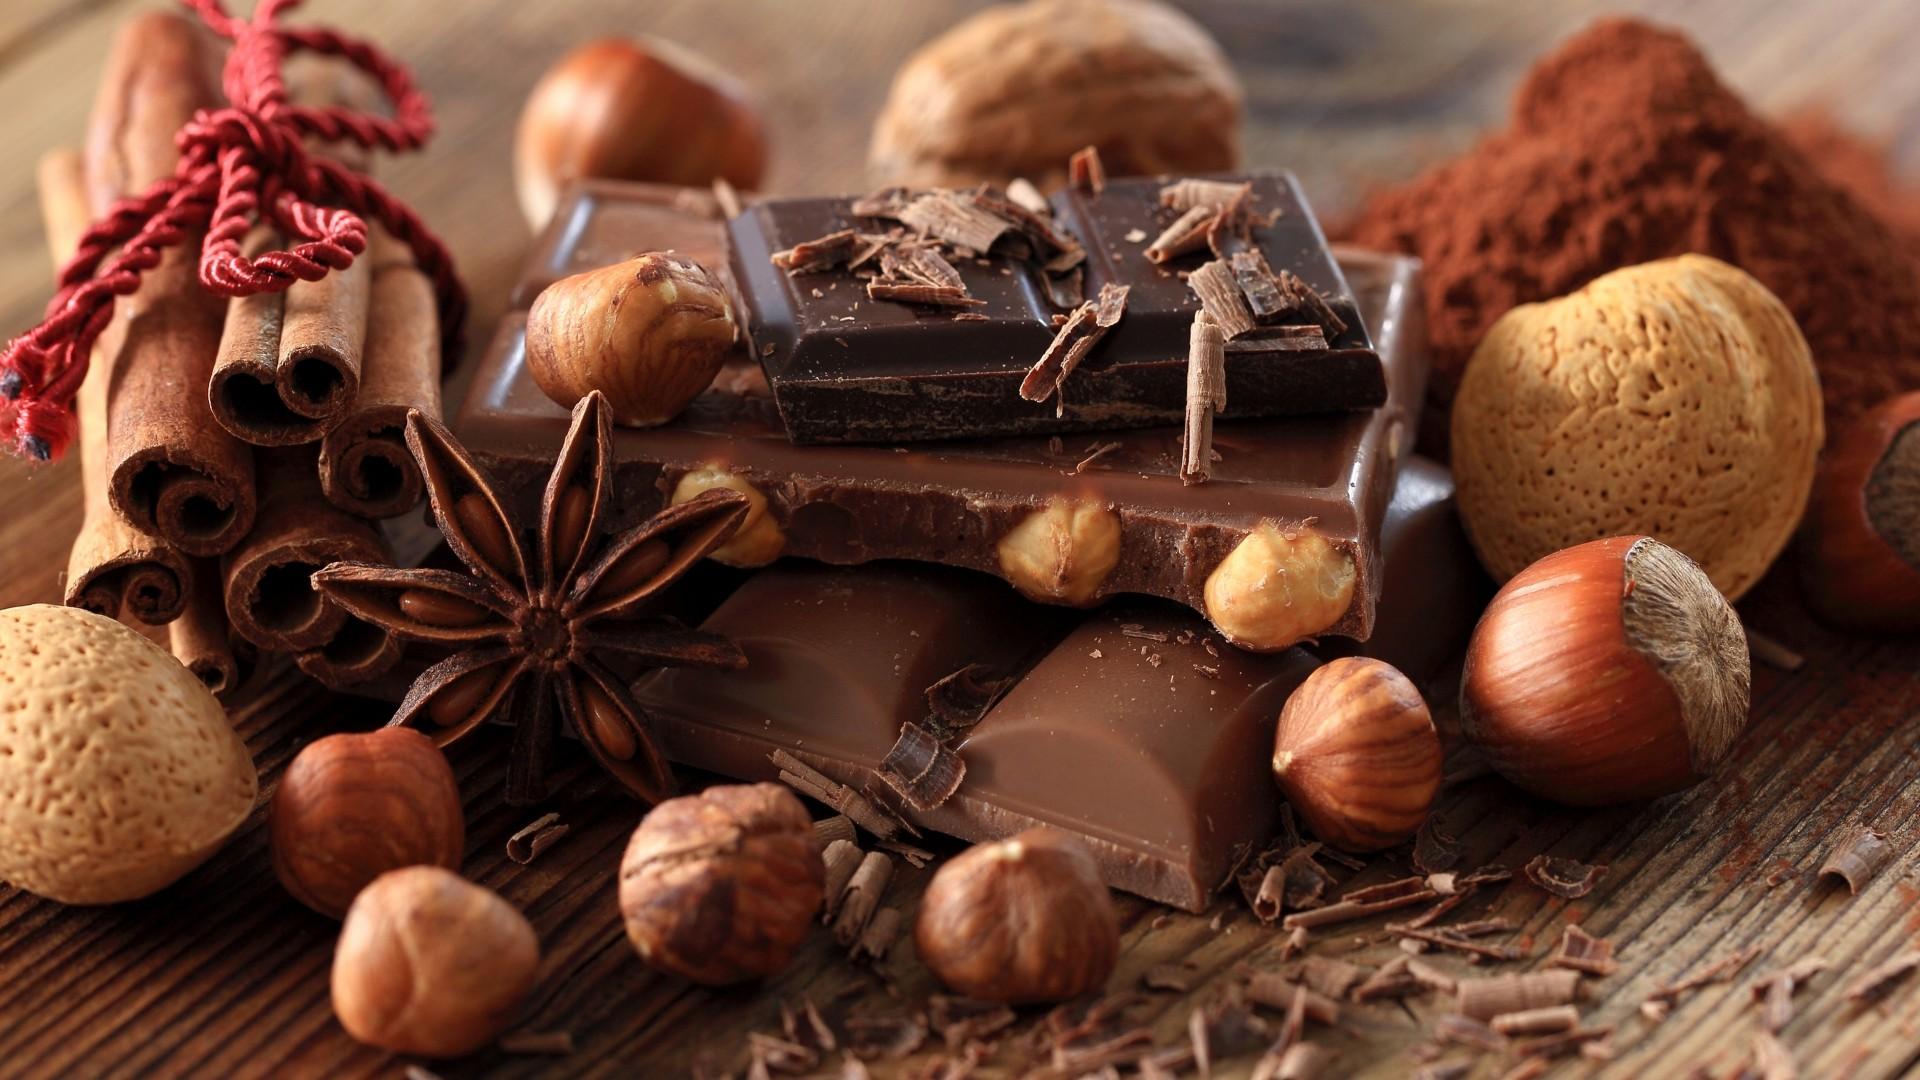 Chocolate Chocolate 1920x1080